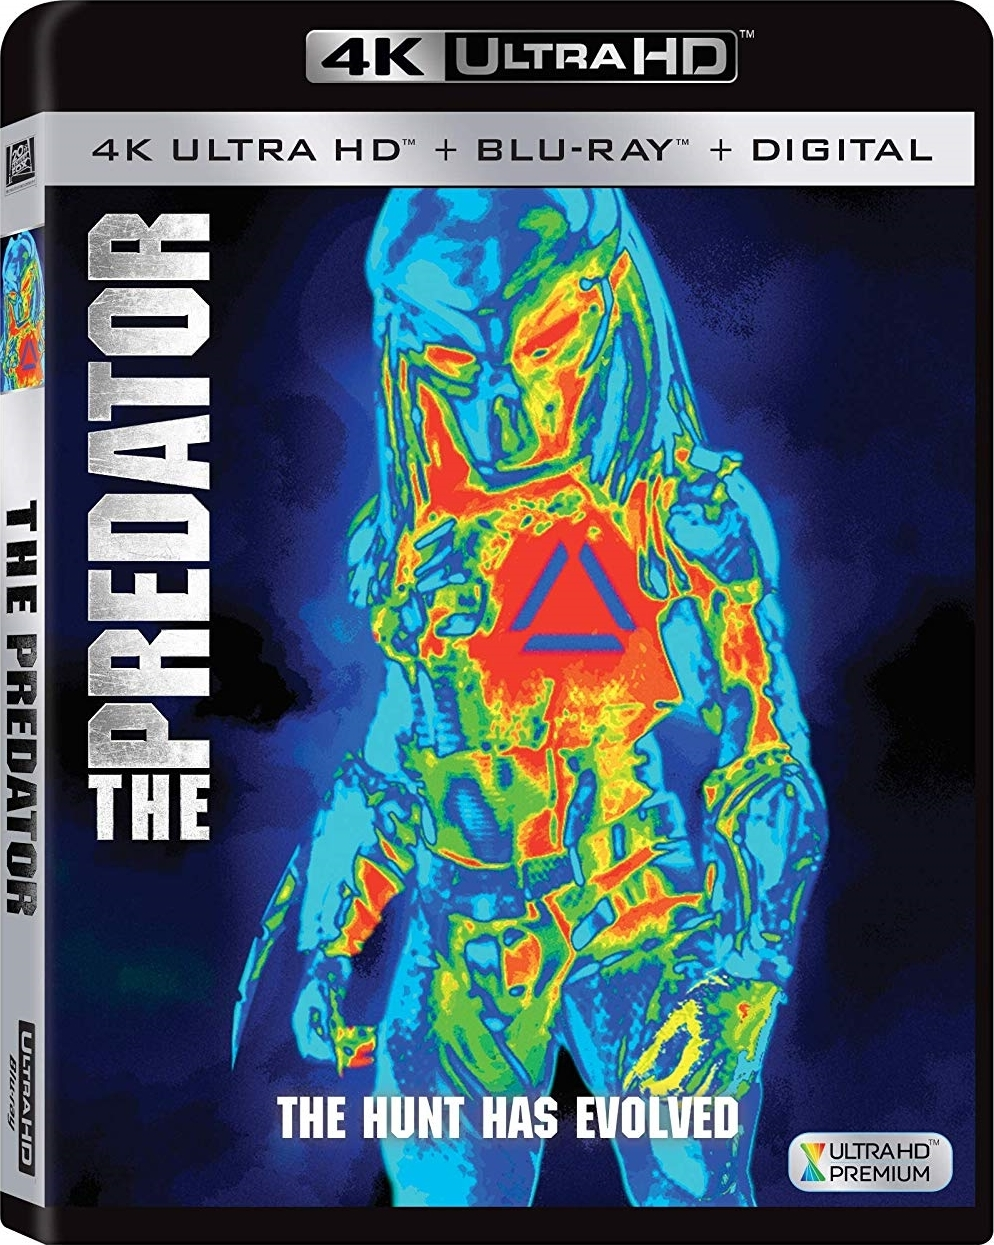 The Predator (2018) poster image